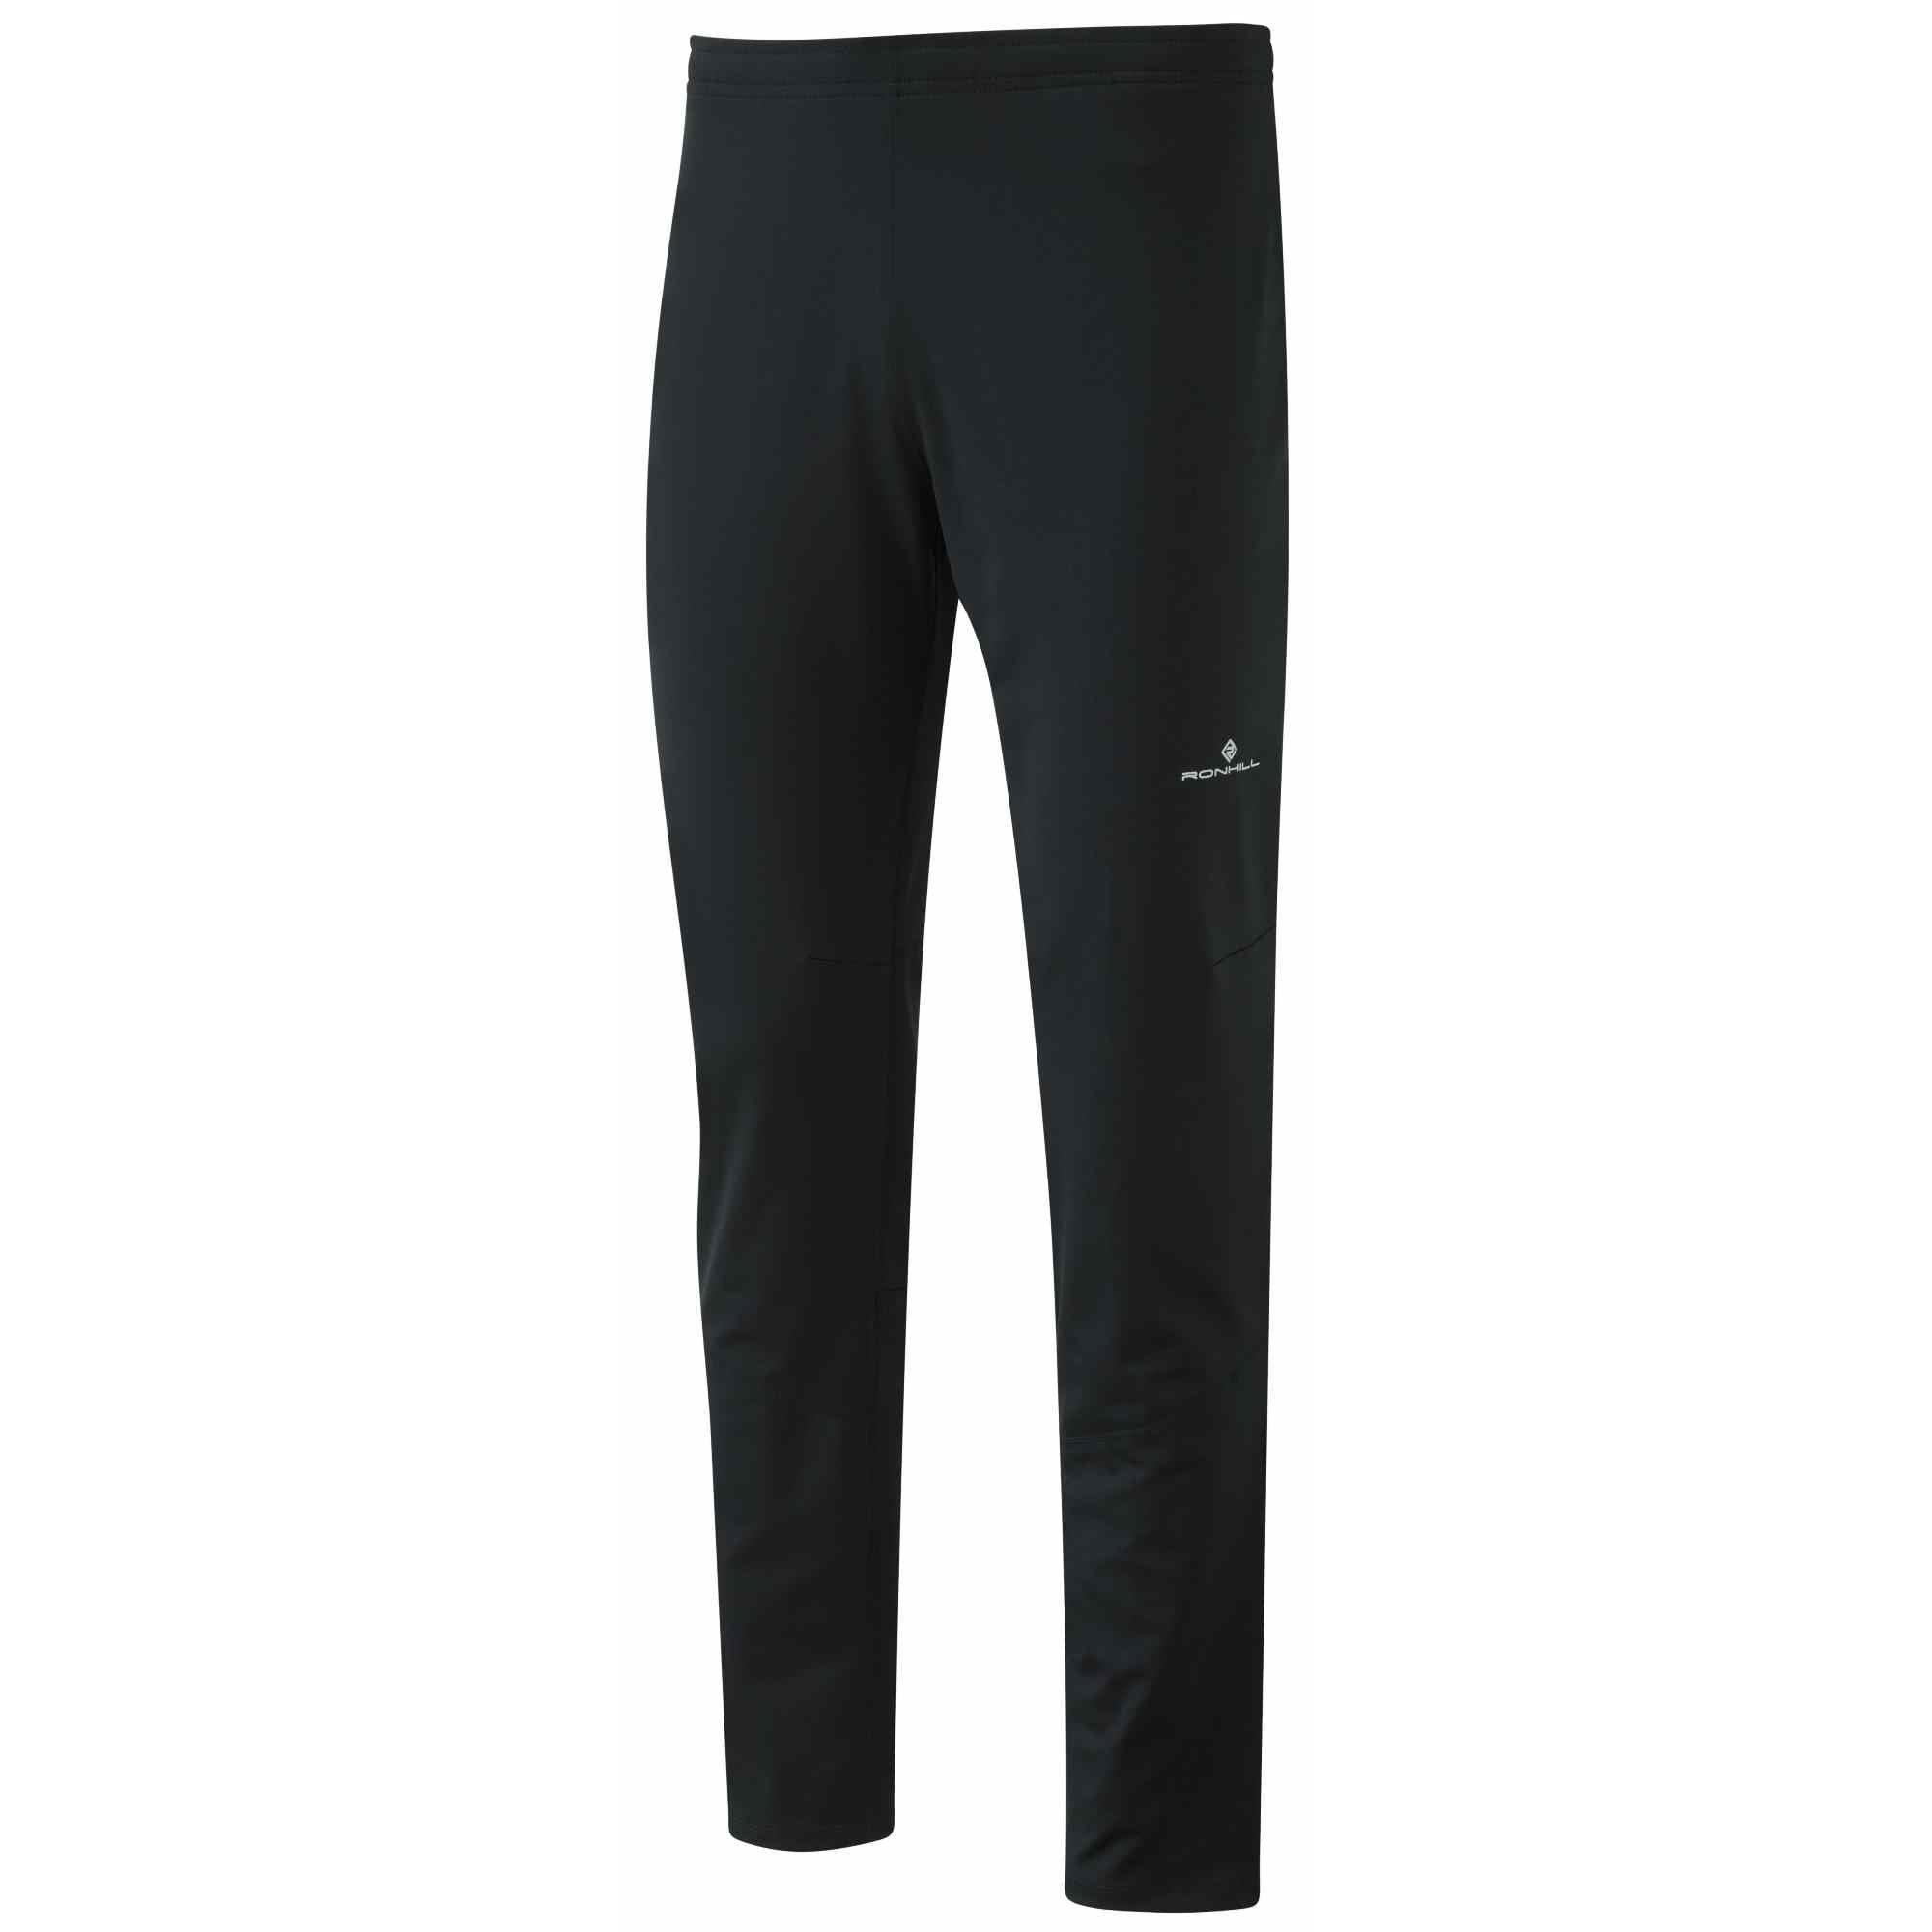 RONHILL Herren EVERYDAY Slim Hose XL All Black